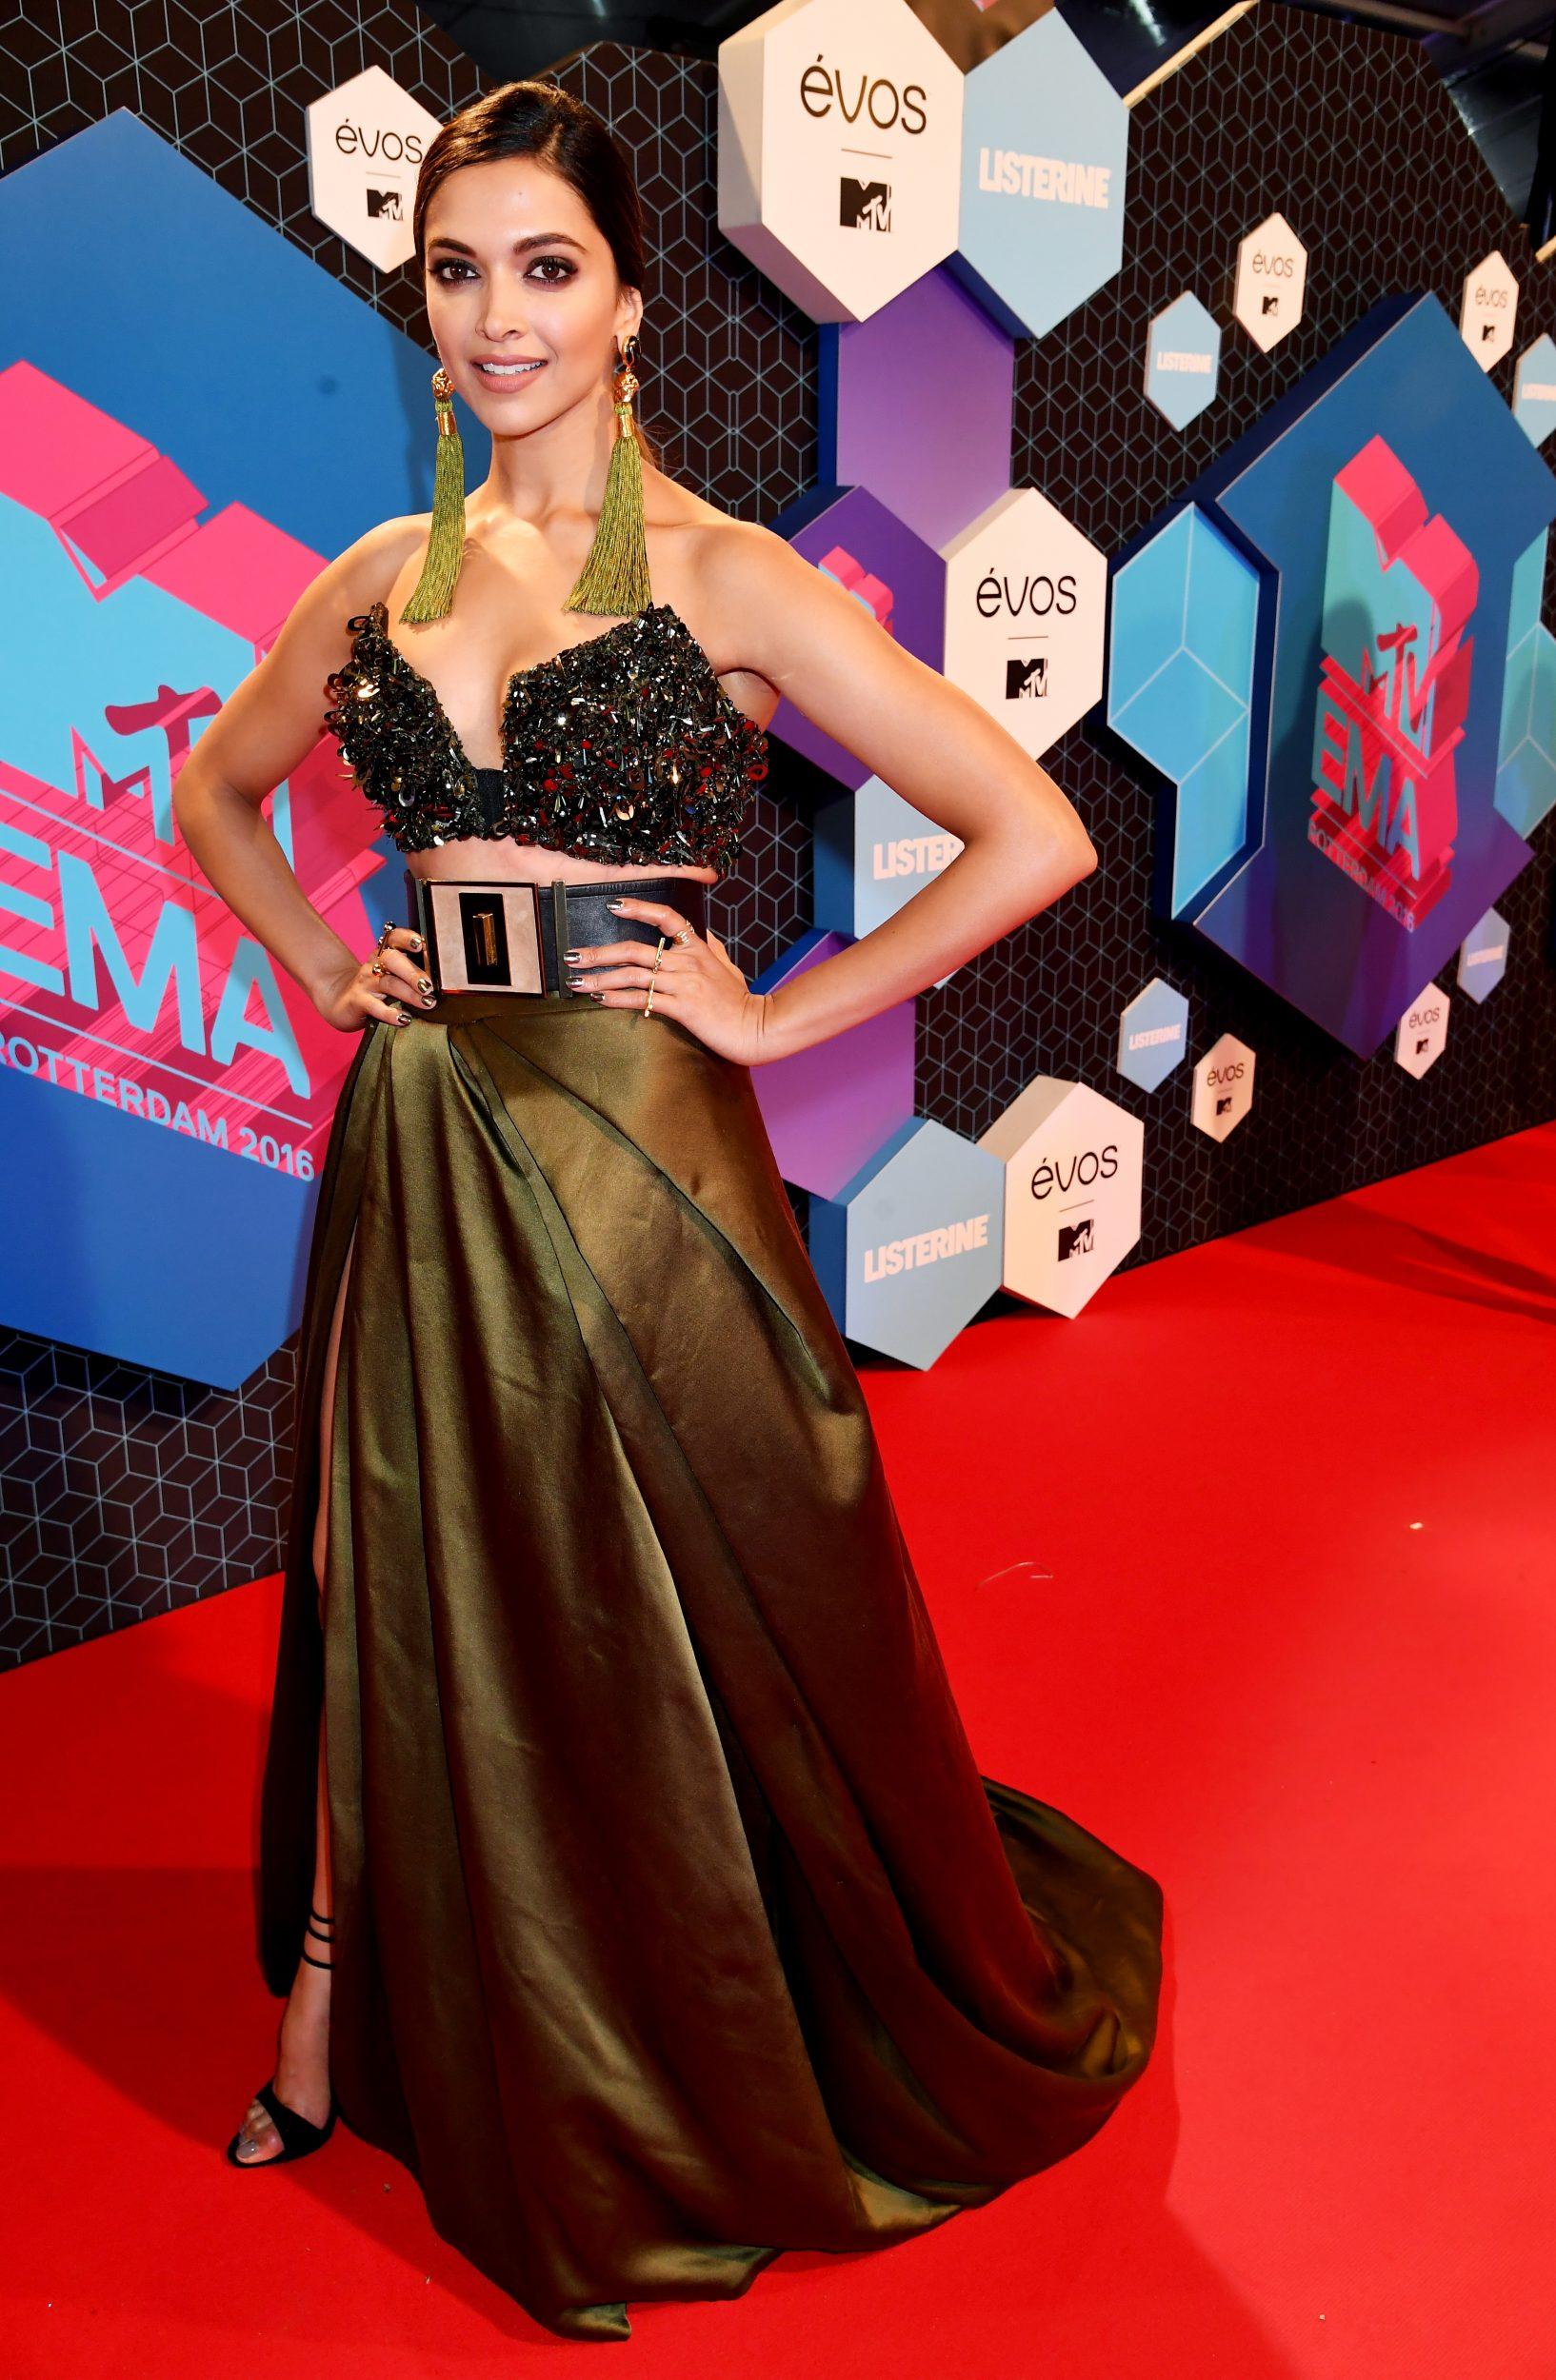 ROTTERDAM, NETHERLANDS - NOVEMBER 06: Actress Deepika Padukone attends the MTV Europe Music Awards 2016 on November 6, 2016 in Rotterdam, Netherlands. (Photo by Jeff Kravitz/FilmMagic) *** Local Caption *** Deepika Padukone